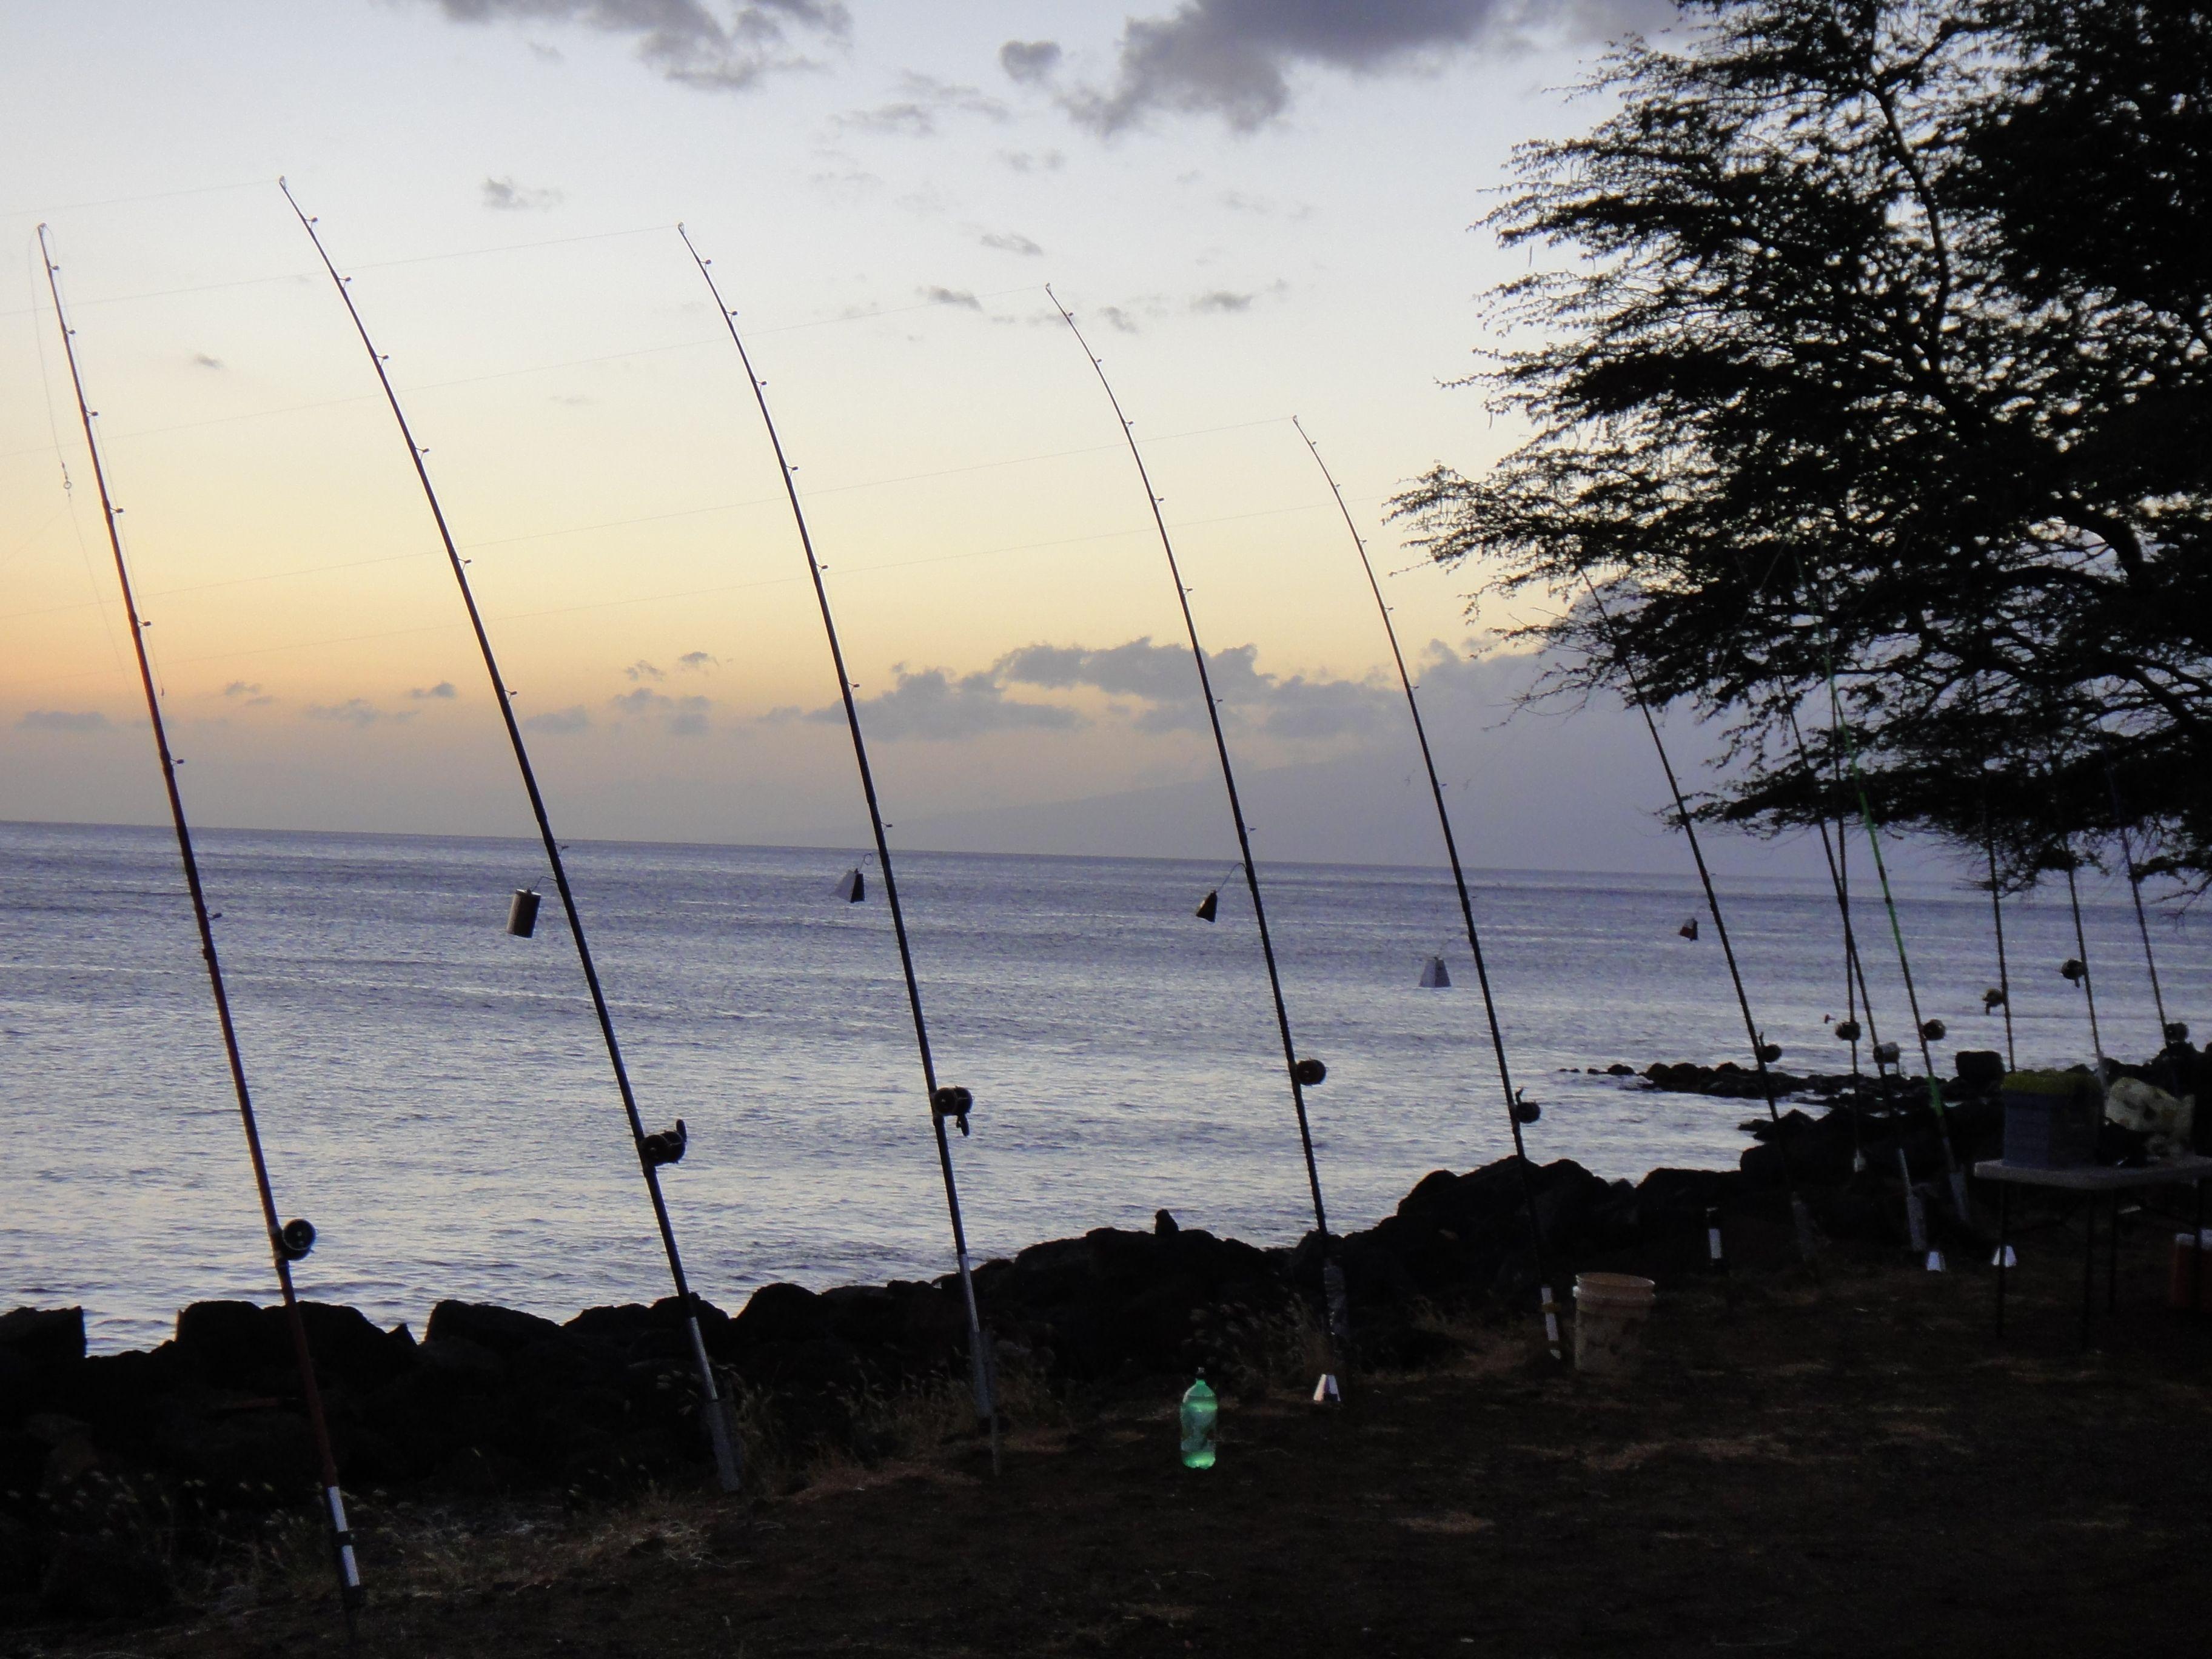 Ulua fishing at Wahikuli Park in Lahaina The ulua fishermen set 3648x2736